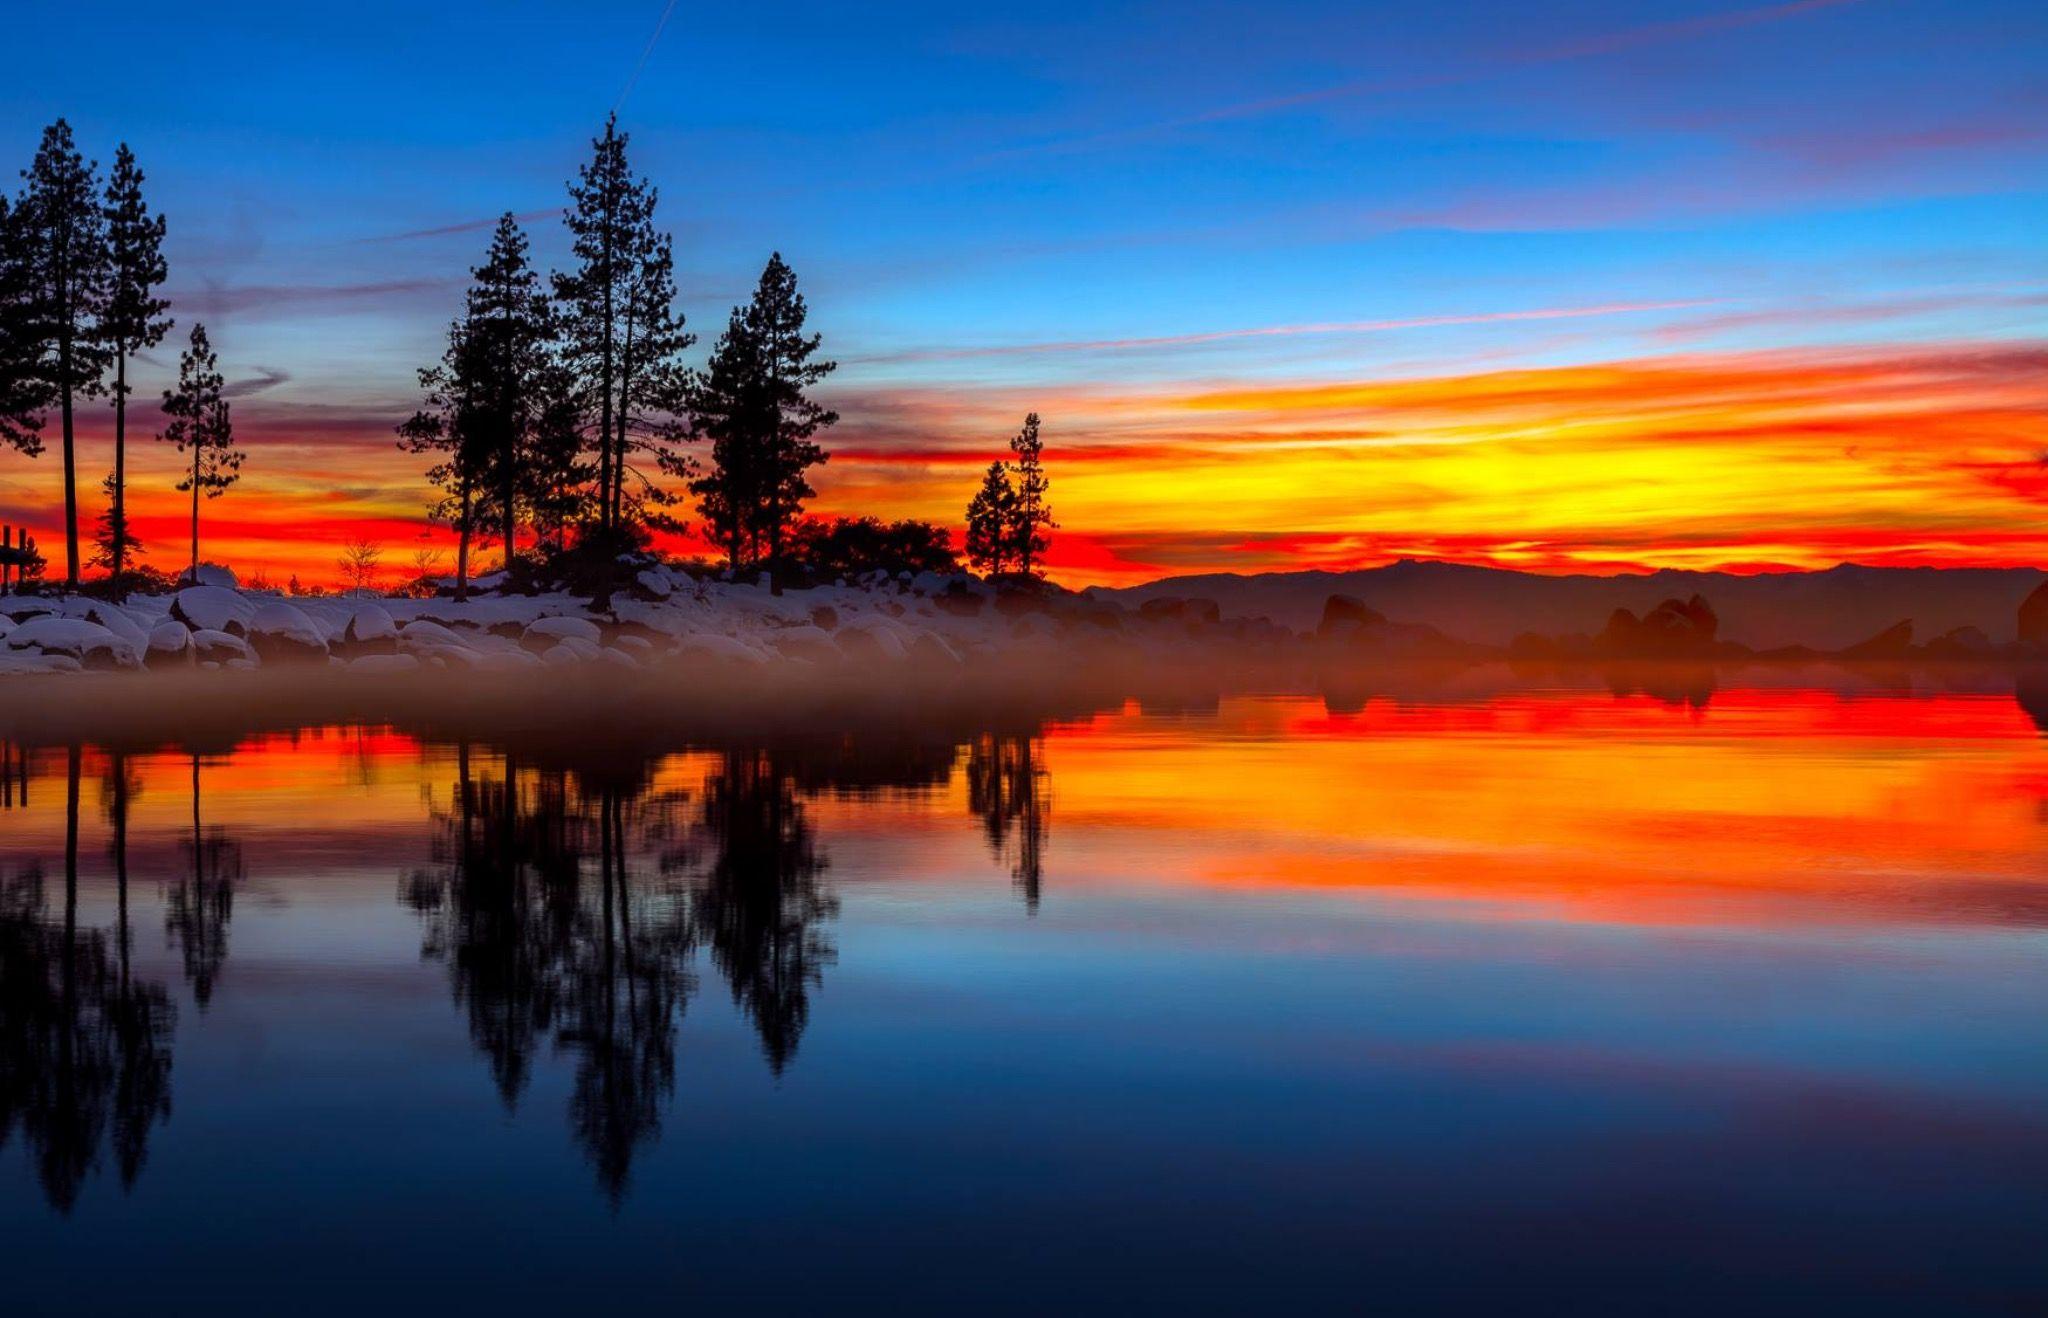 Lake Tahoe February 2017 | Sunrise Sunset, Lake Tahoe, Tahoe Pertaining To Lake Tahoe Activities Calendar Febuary